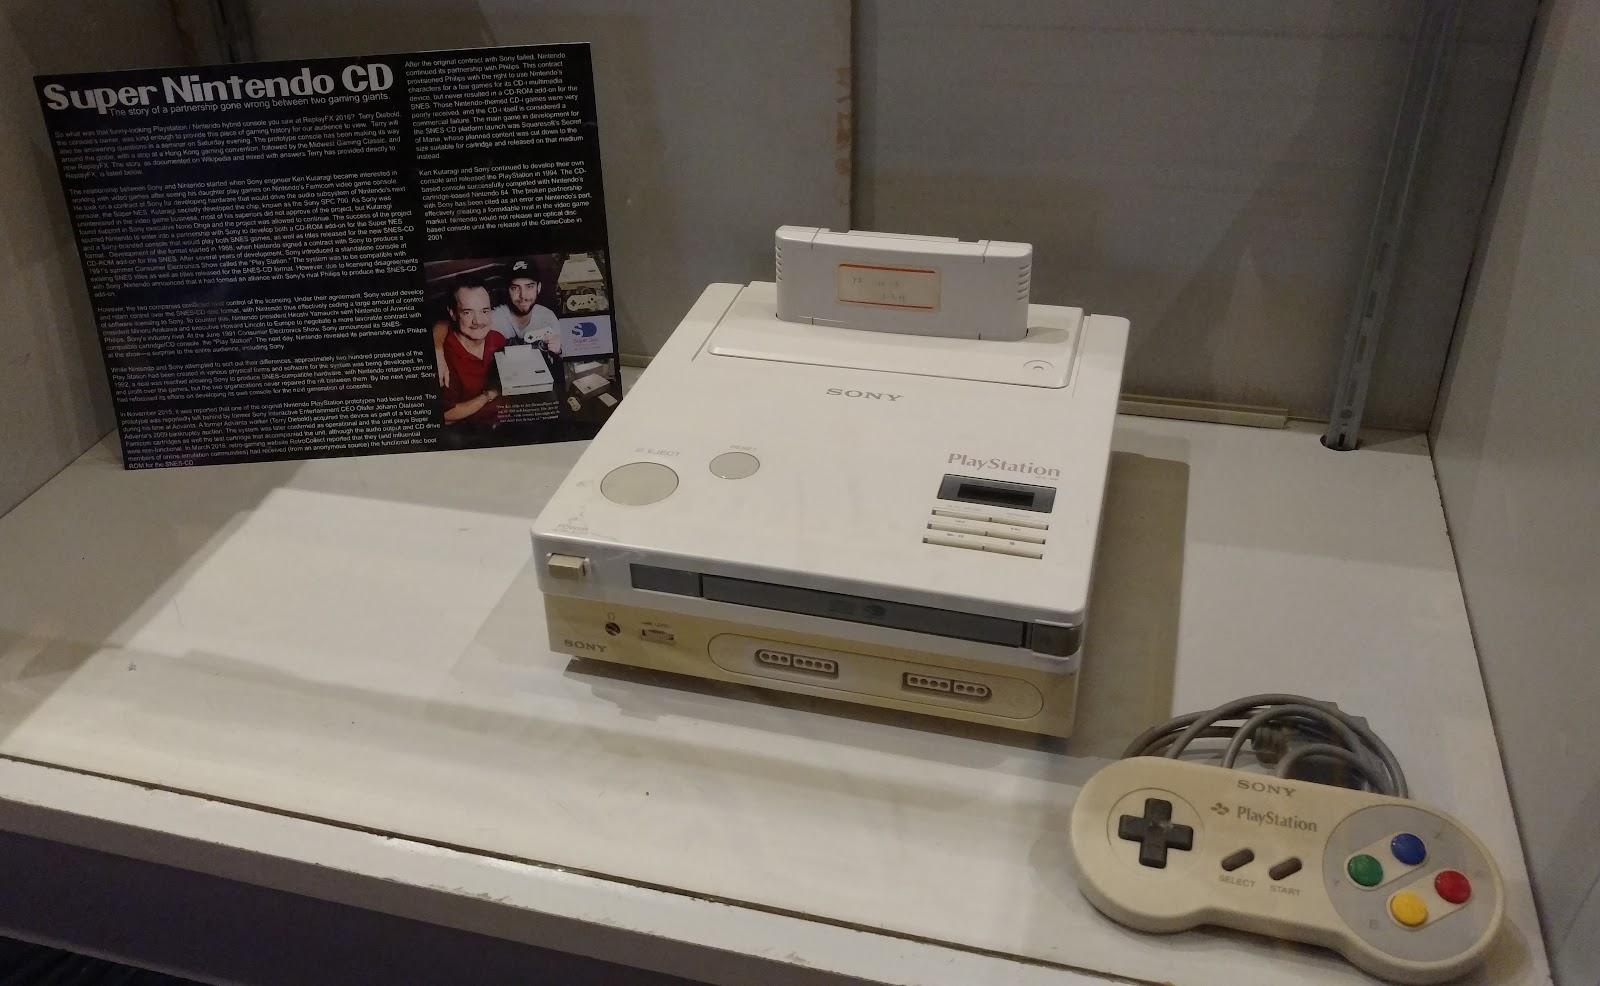 Nintendo Sony system crop.jpg